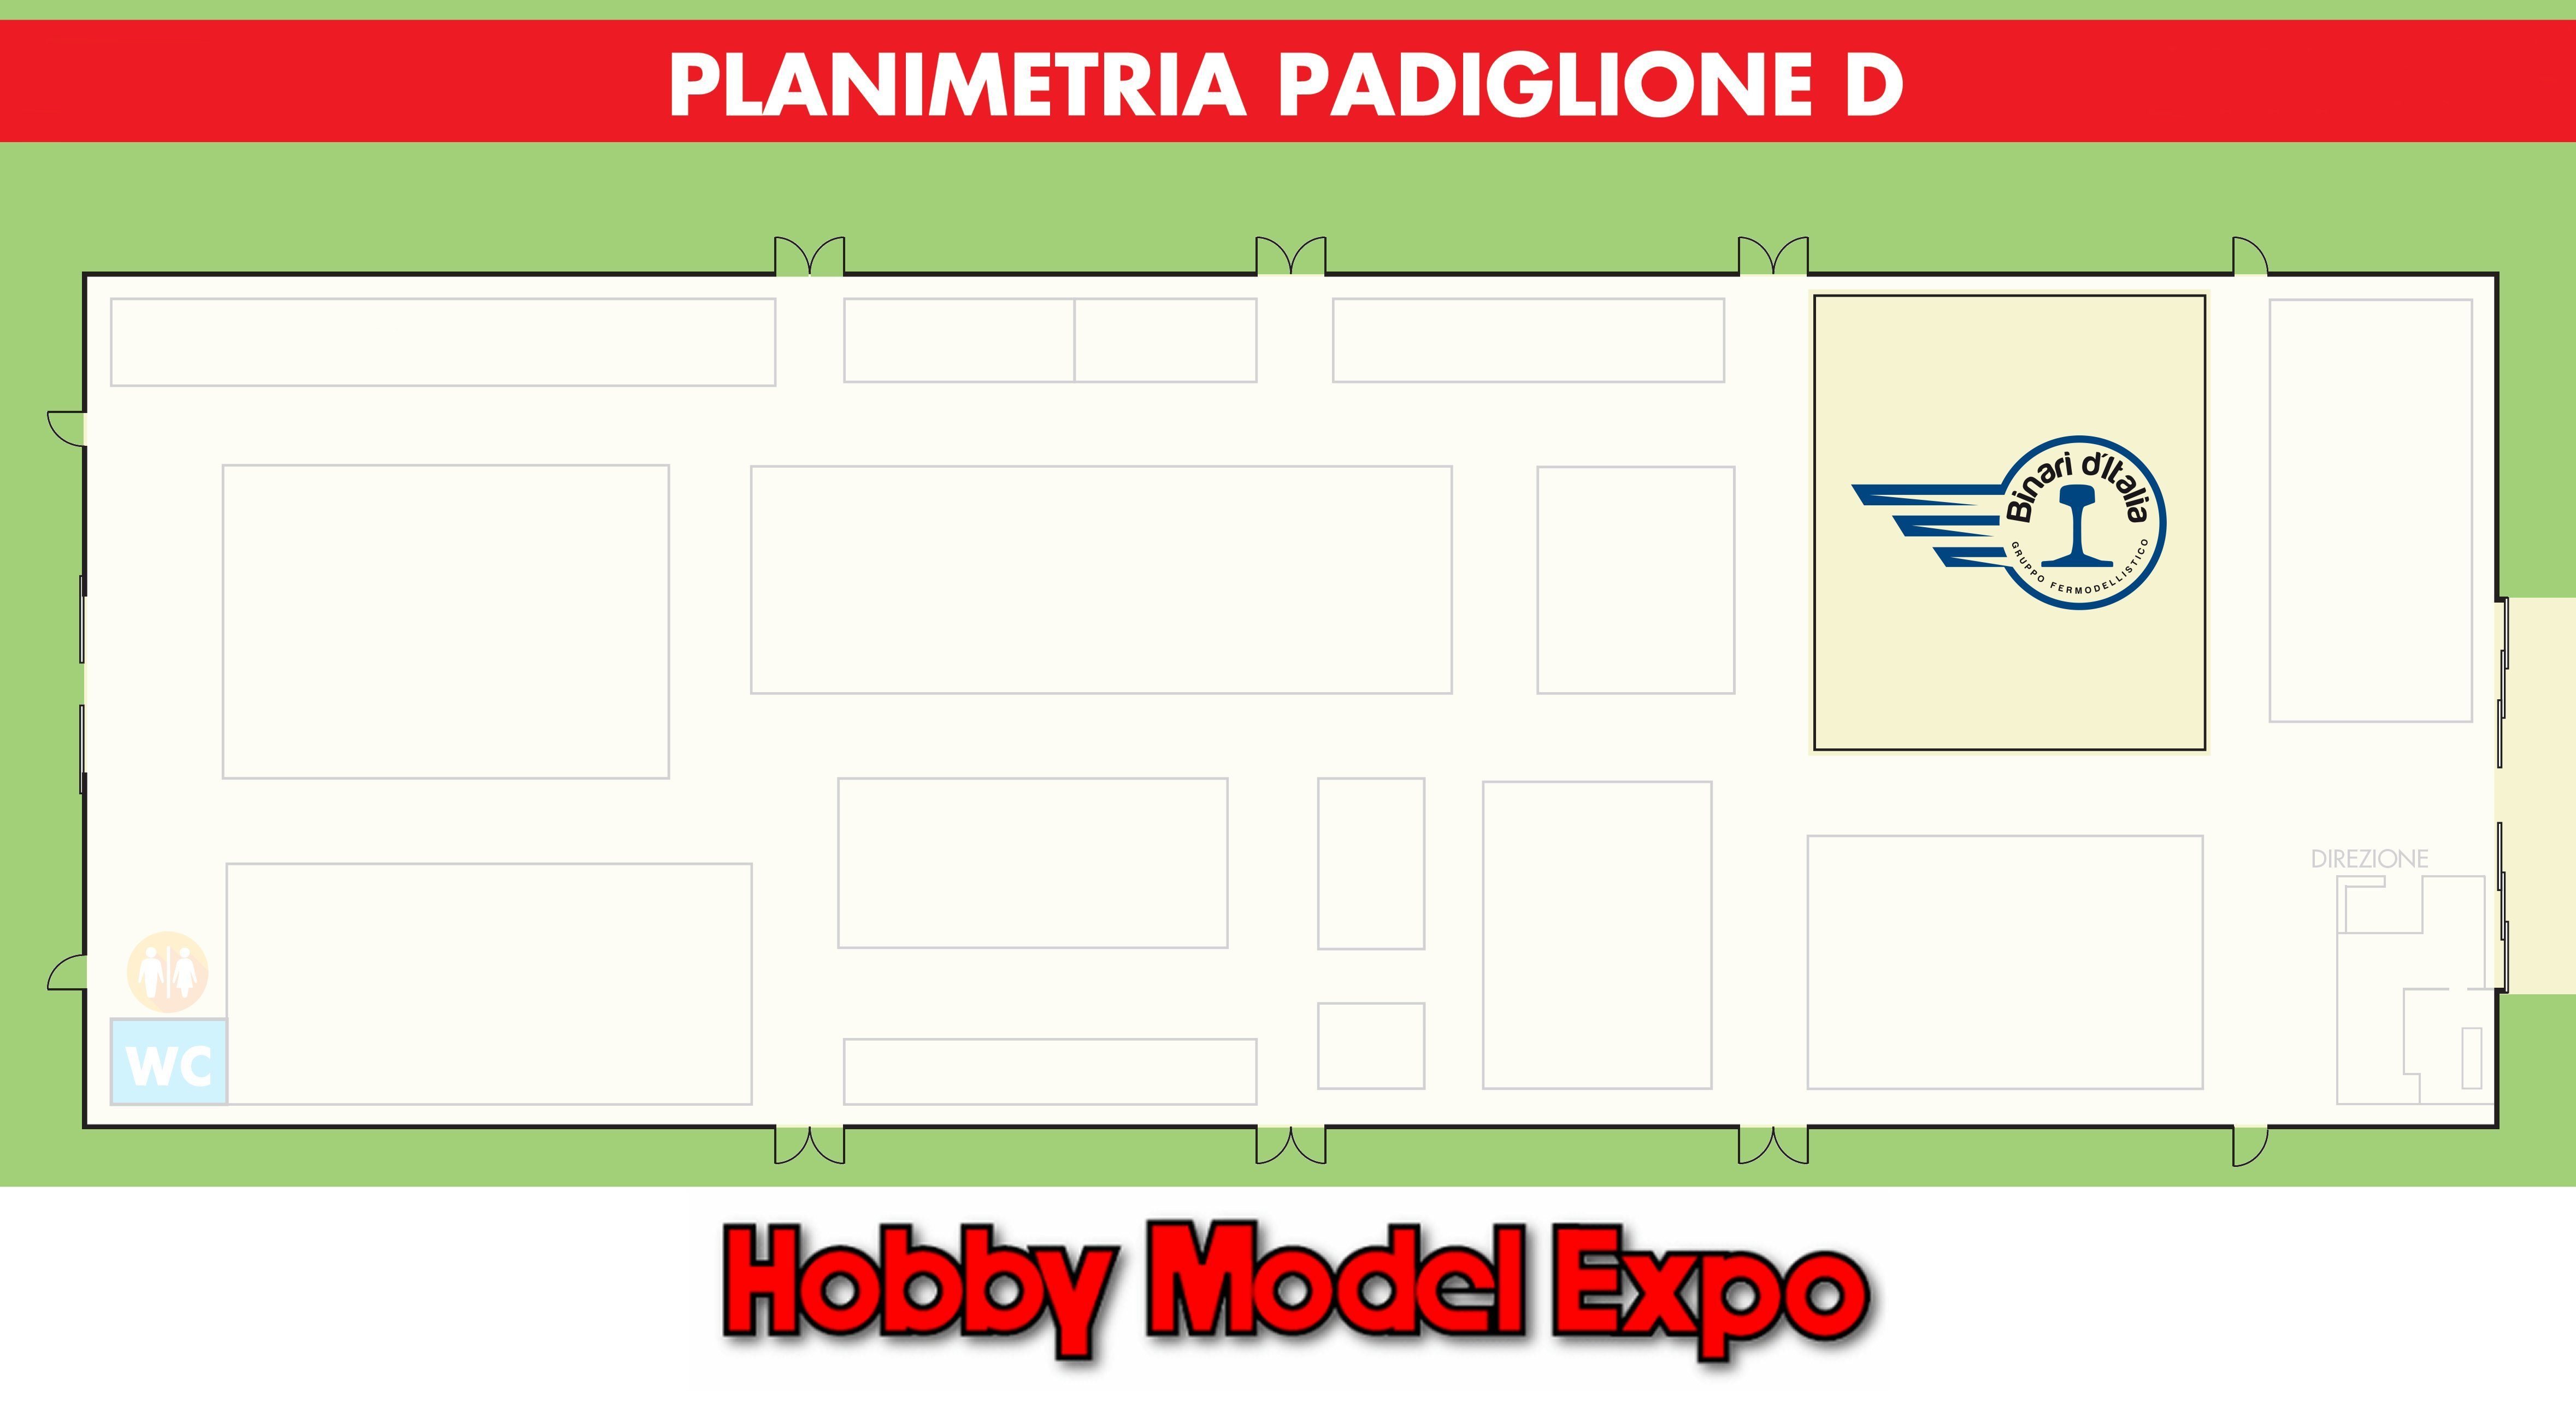 PIANTA_PAD_HME_17 - Pad D _2